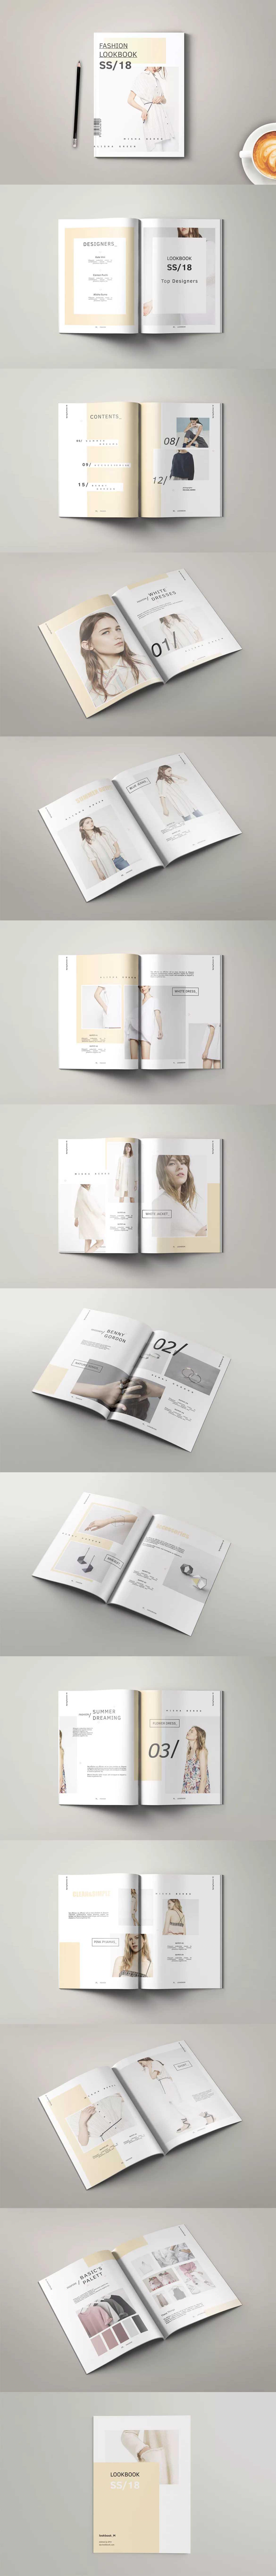 Fashion Lookbook Template InDesign INDD A4 | Lookbook Templates ...